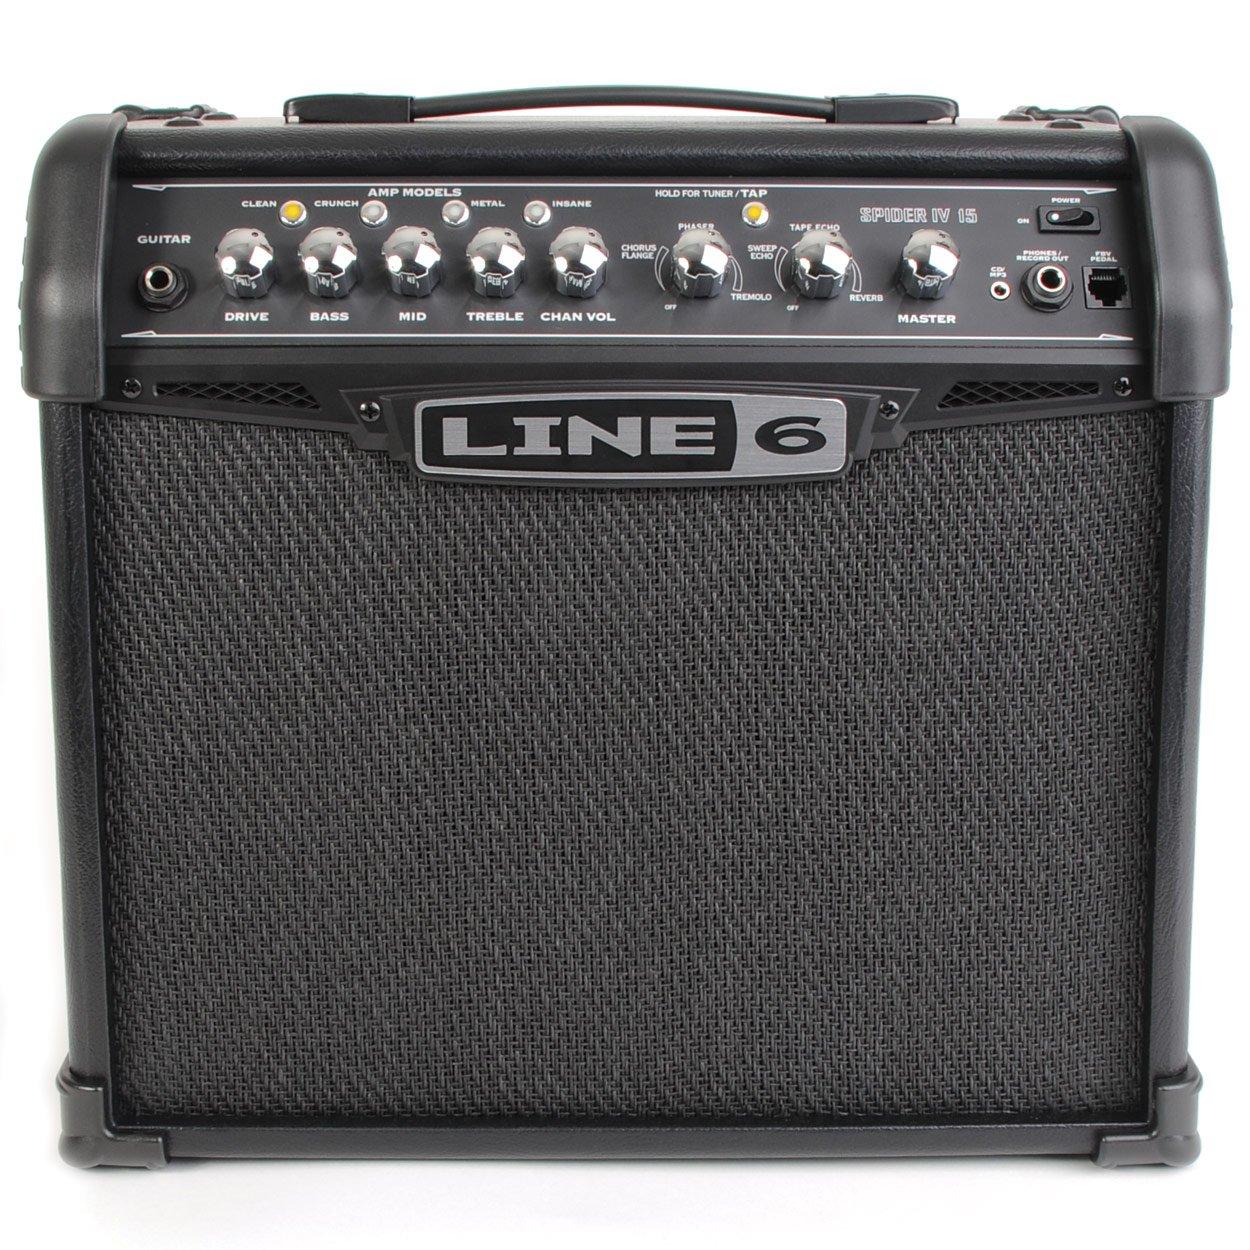 Line 6 Spider IV 15 - Amplificador para guitarra product image